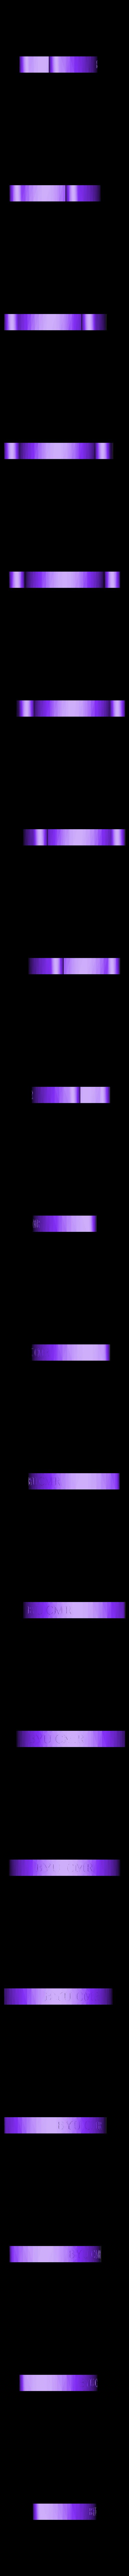 10holesMedium.STL Download free STL file CurvedLinks: Medium size circular links (LEGO Compatible) • 3D print template, byucmr